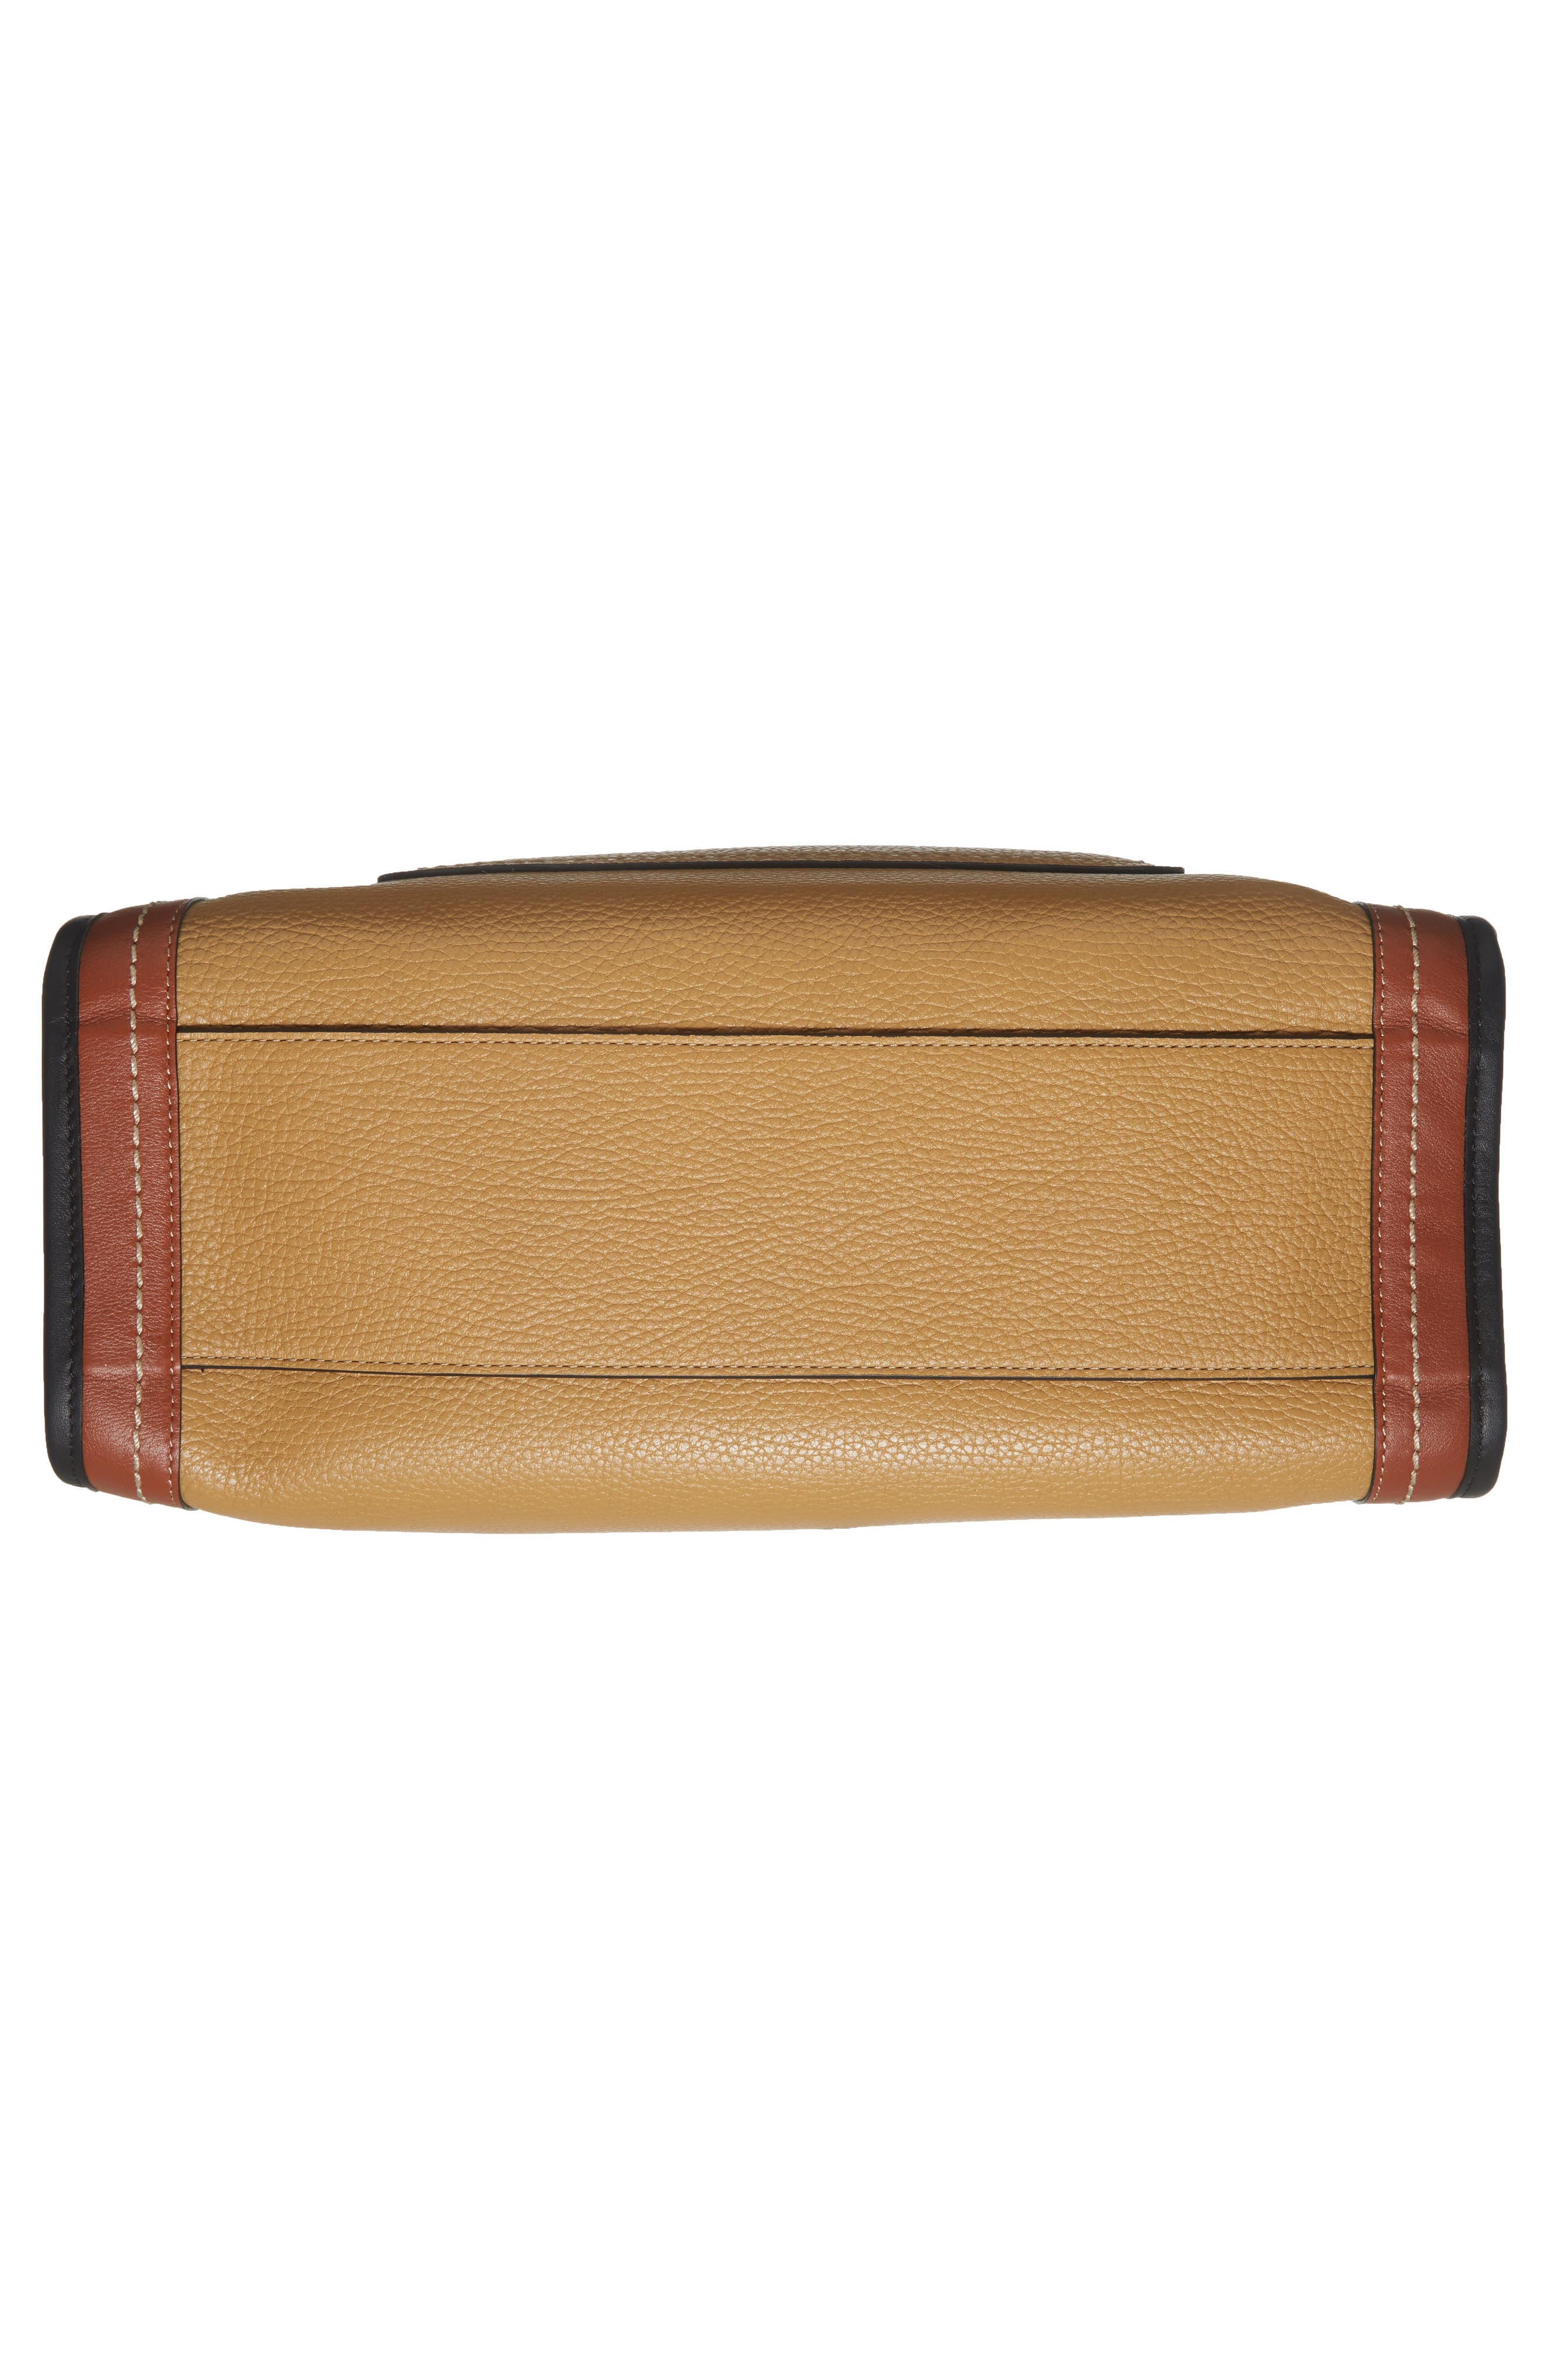 The Dalmatian Grind East/West Leather Shopper & Genuine Calf Hair Pouch,                             Alternate thumbnail 4, color,                             Beige Multi